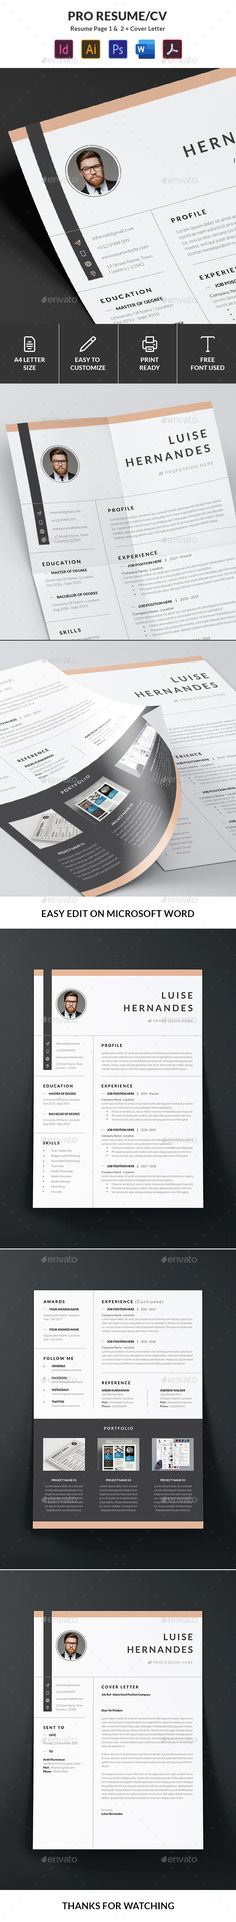 Resume / CV Template Cv Template, Templates, Cv Design, Change Image, Resume Cv, Very Well, Photoshop, Words, Minimal